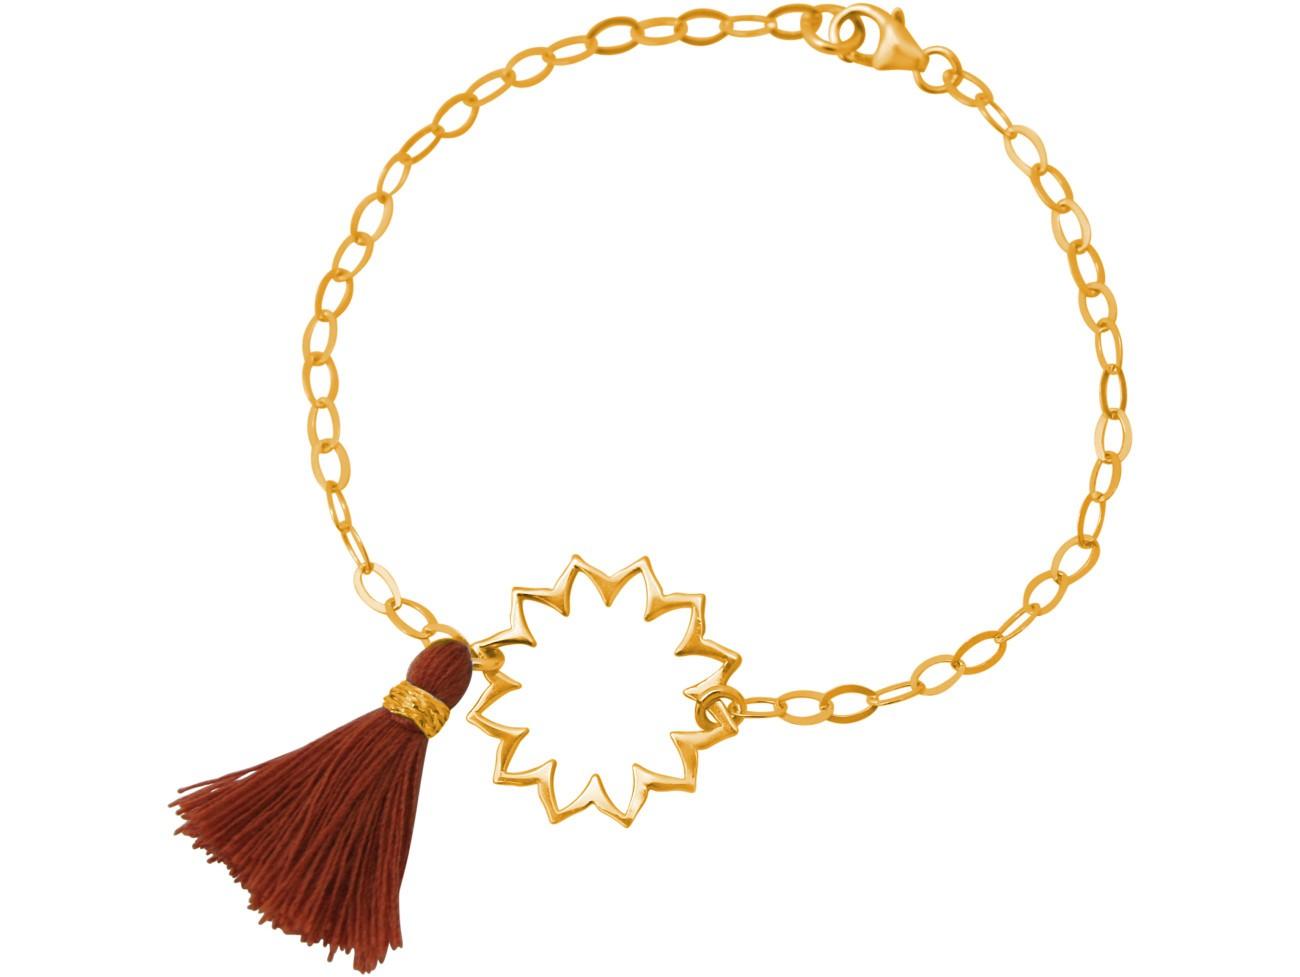 Armband 925 Silber Vergoldet Mandala QuasteRotb...